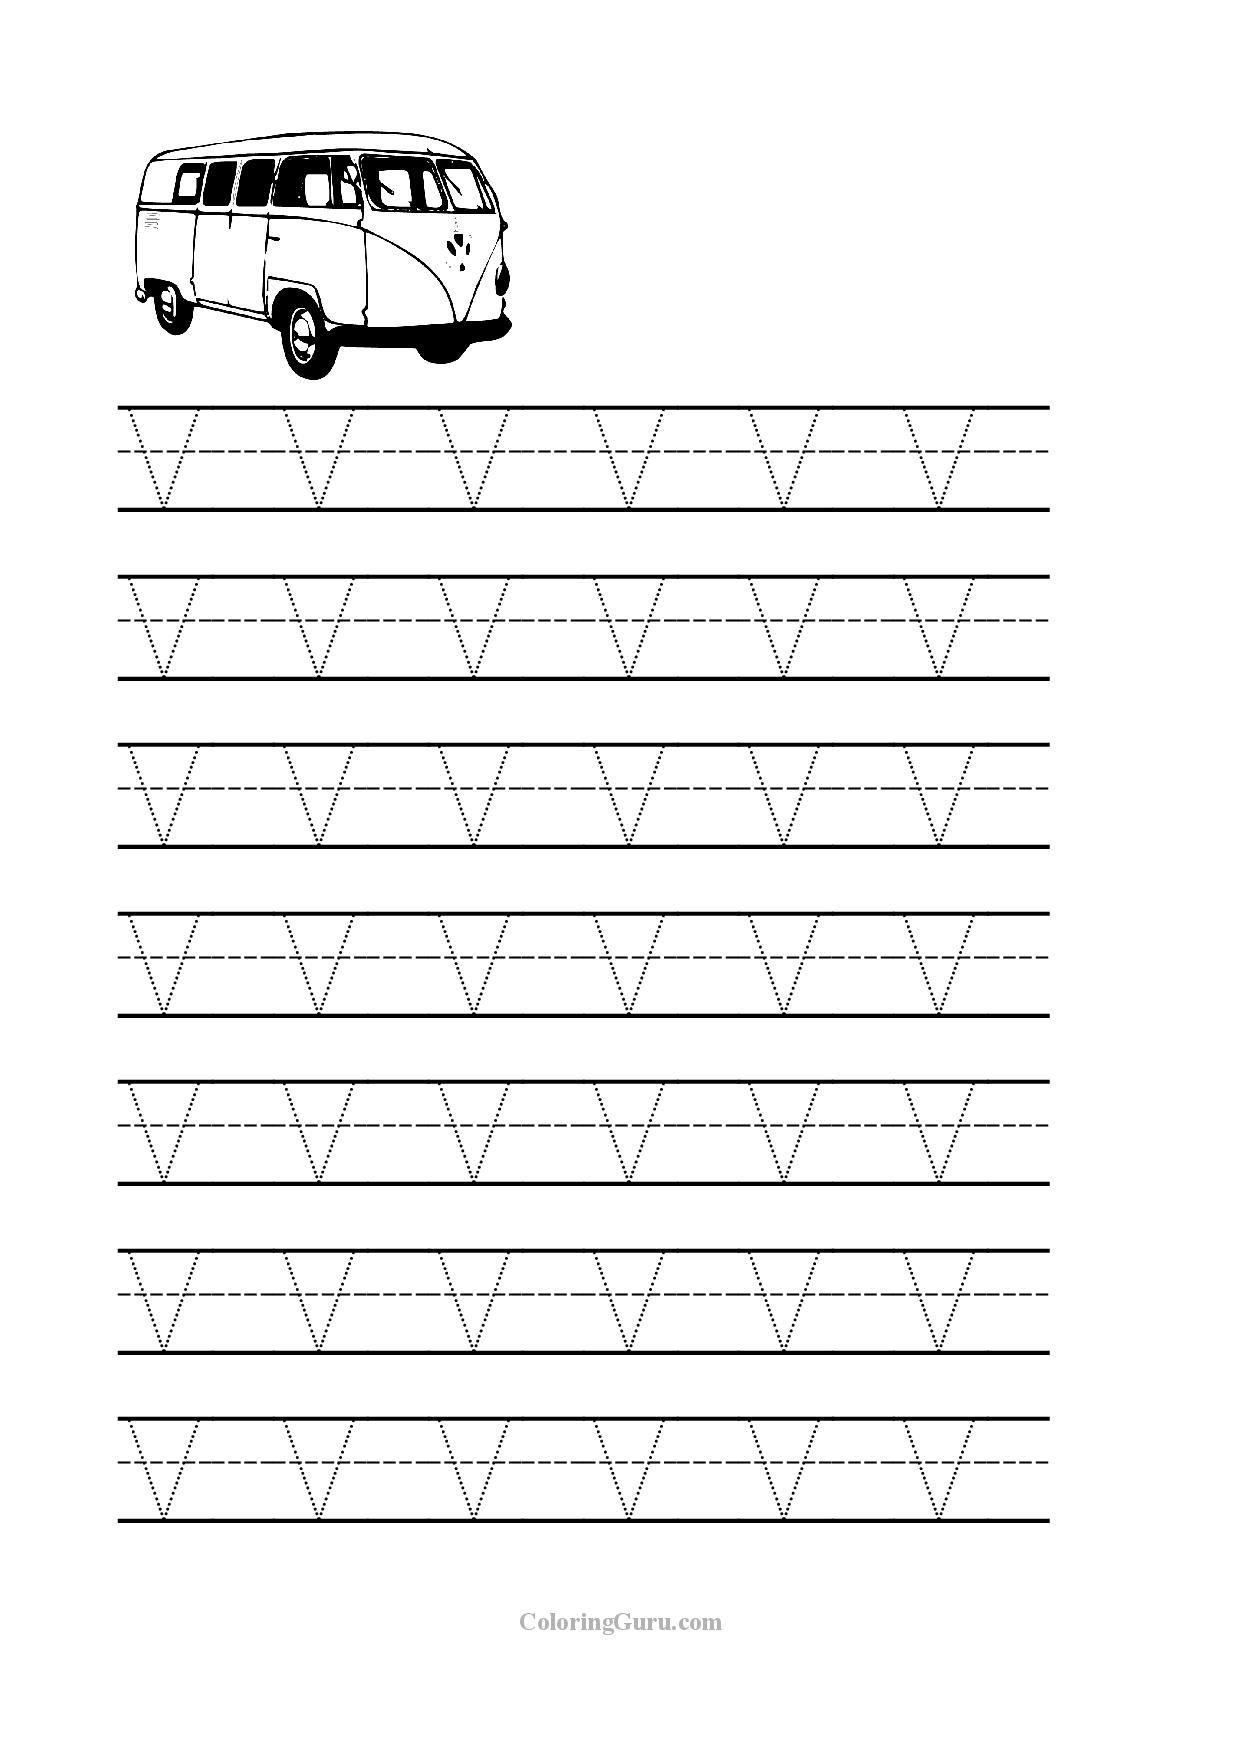 Free Printable Tracing Letter V Worksheets For Preschool within Letter V Tracing Worksheets For Preschool